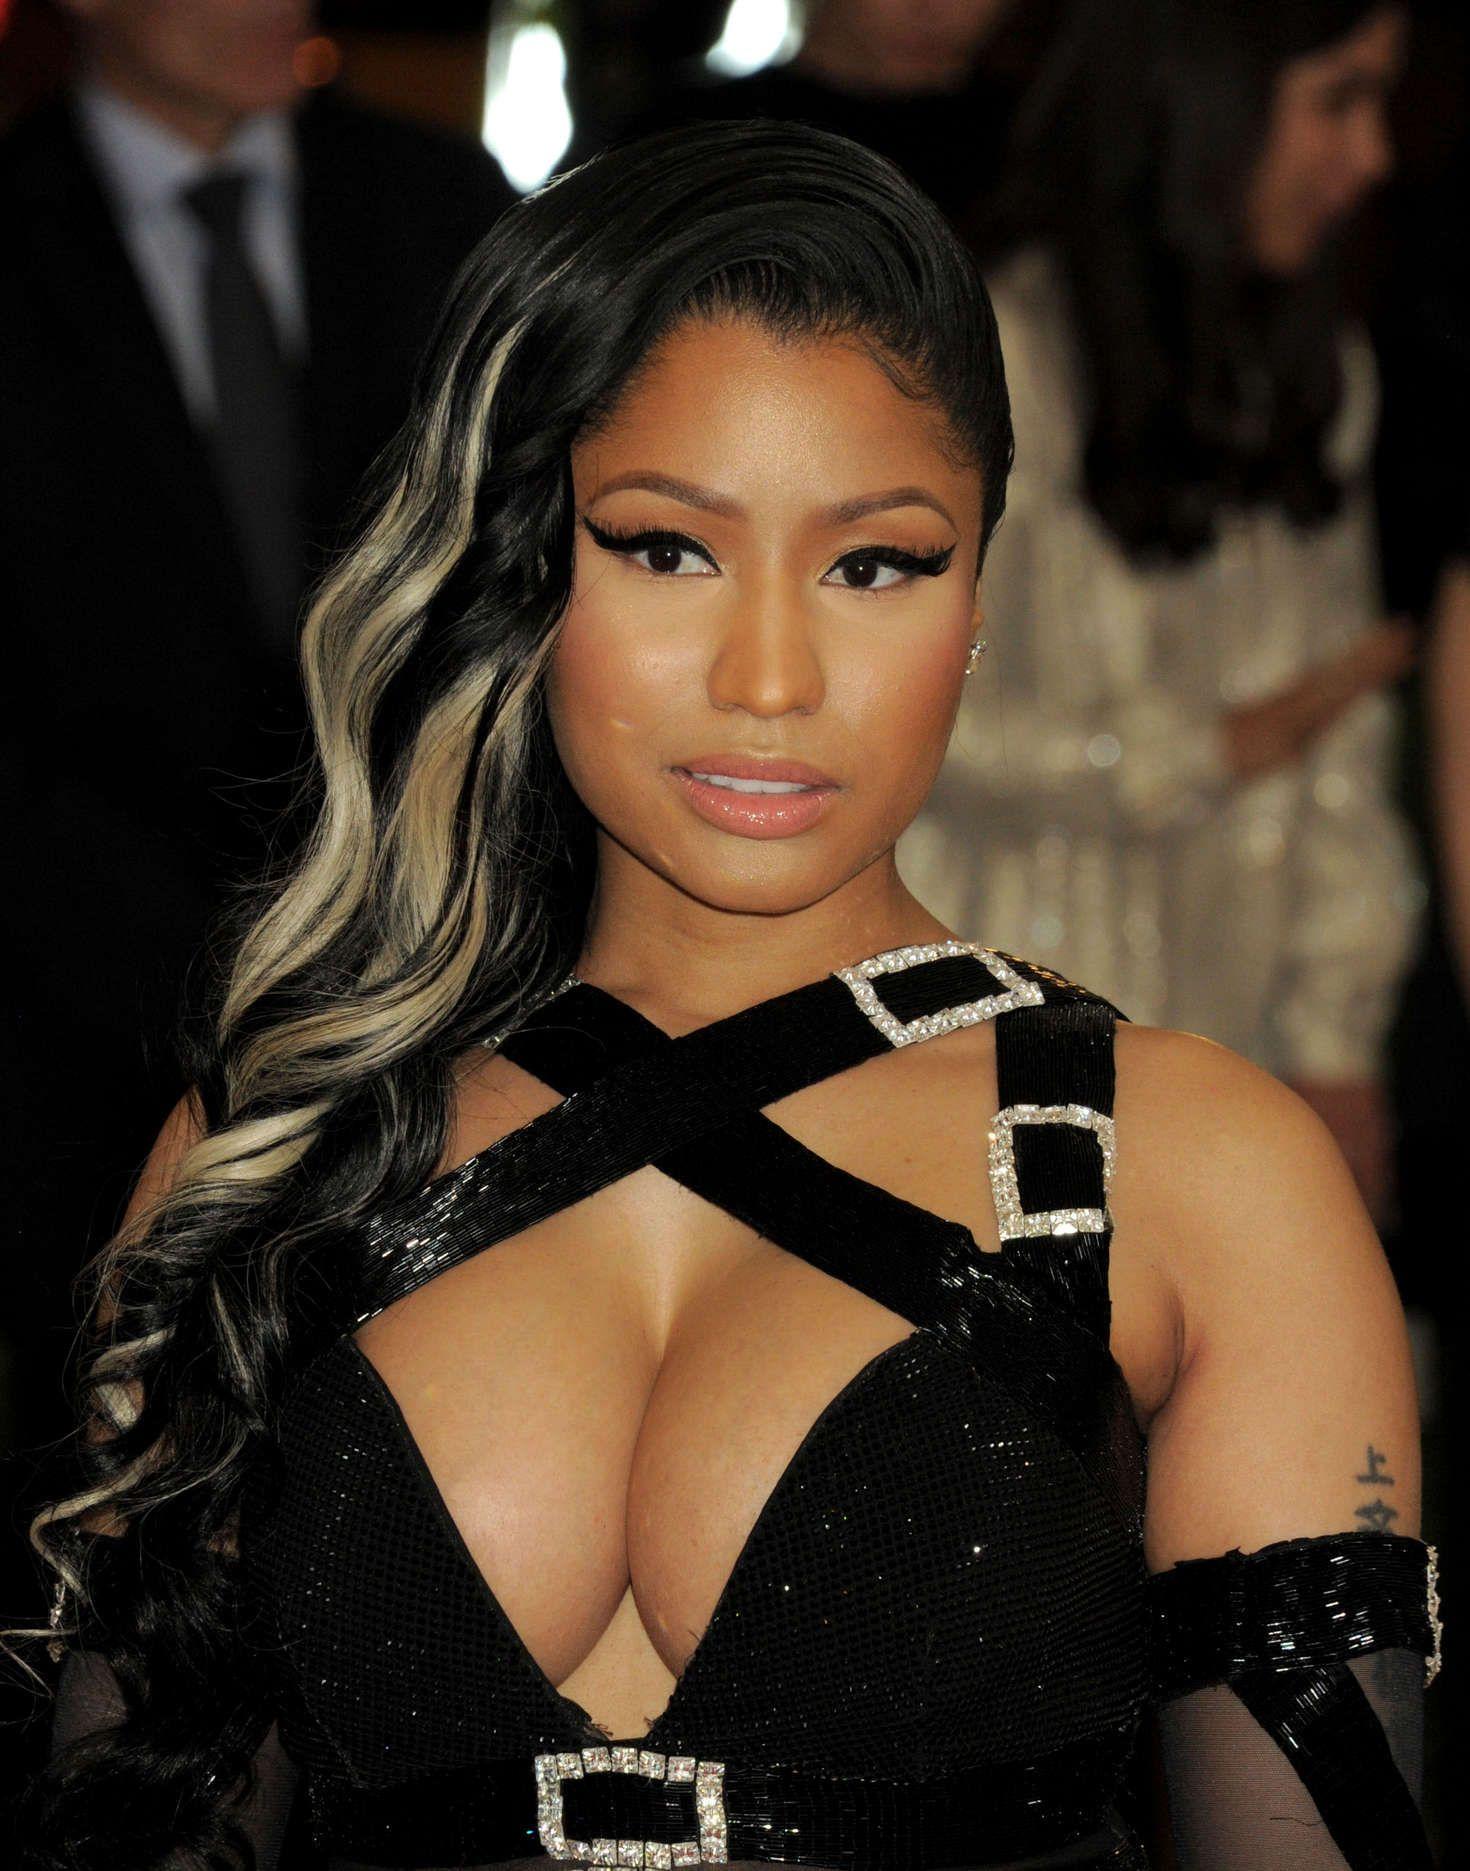 Nicki Minaj in Moschino at 2016 Met Gala in New York City Check more at